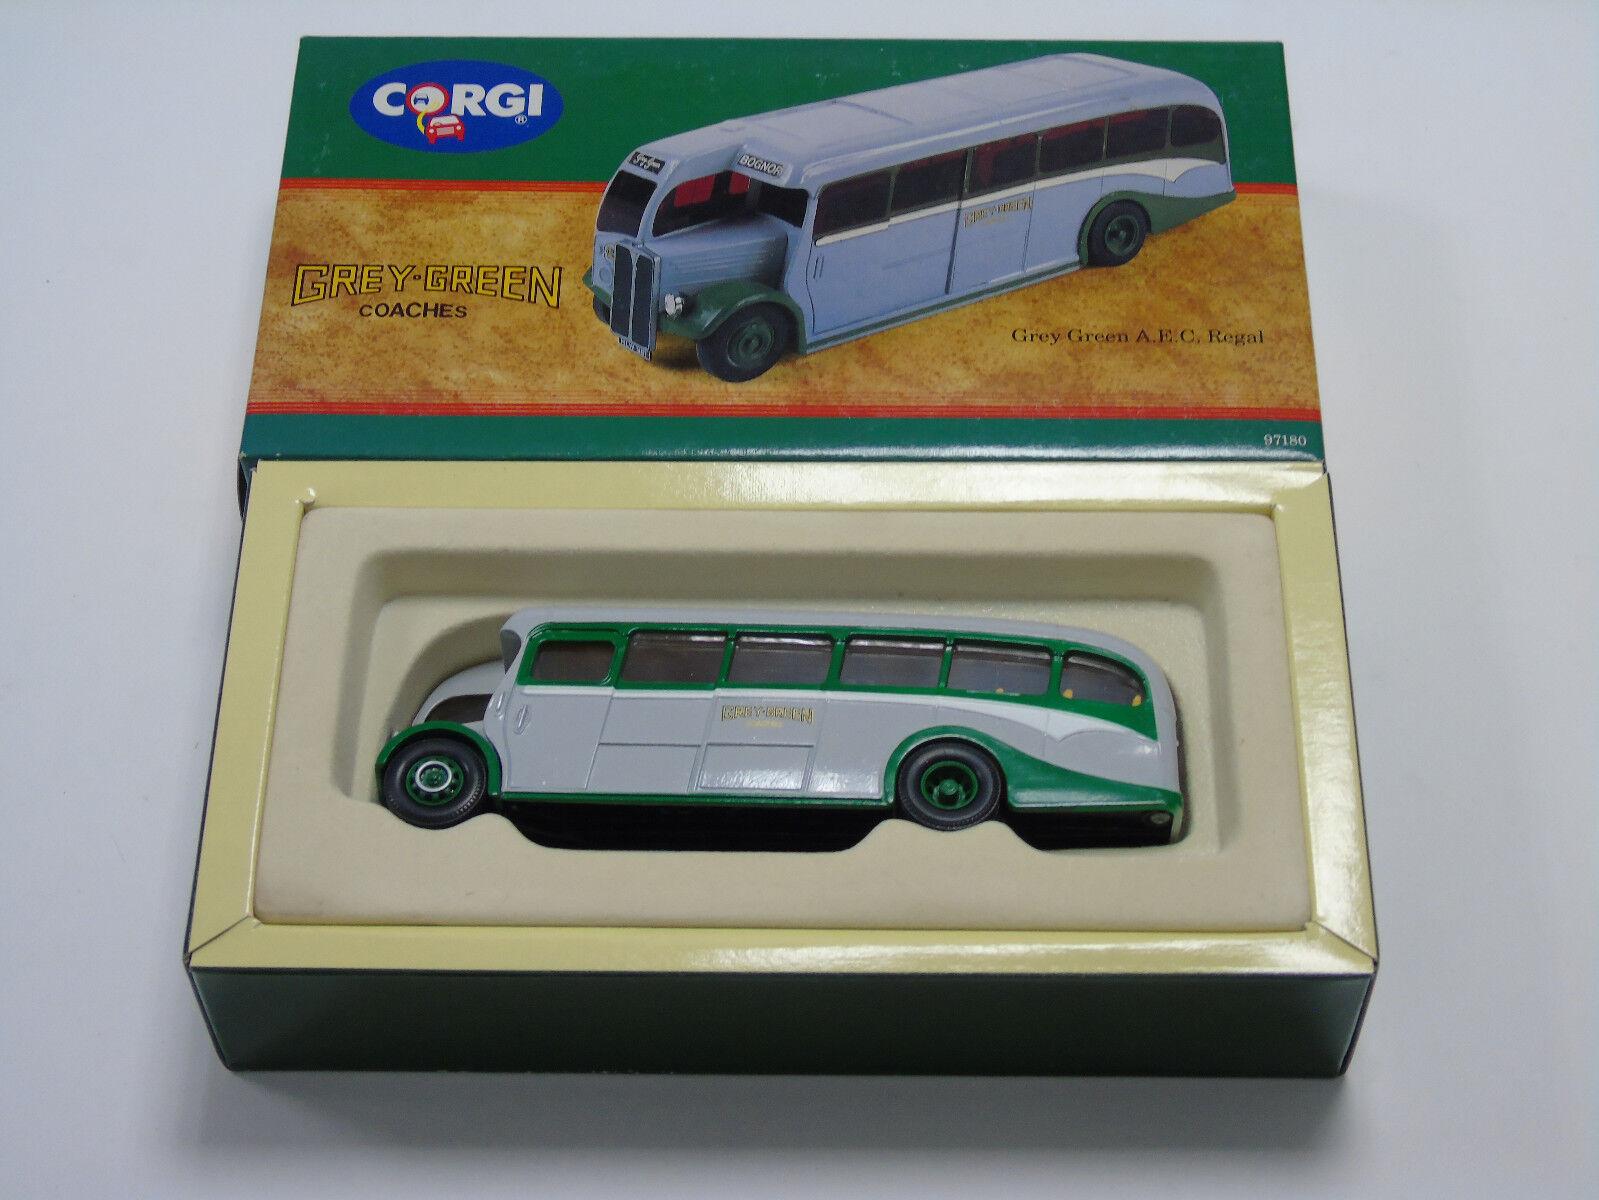 97180 Corgi Pressofusio modelllllerlerli grå grön Aec Regal buss Nuovo e con Scatola